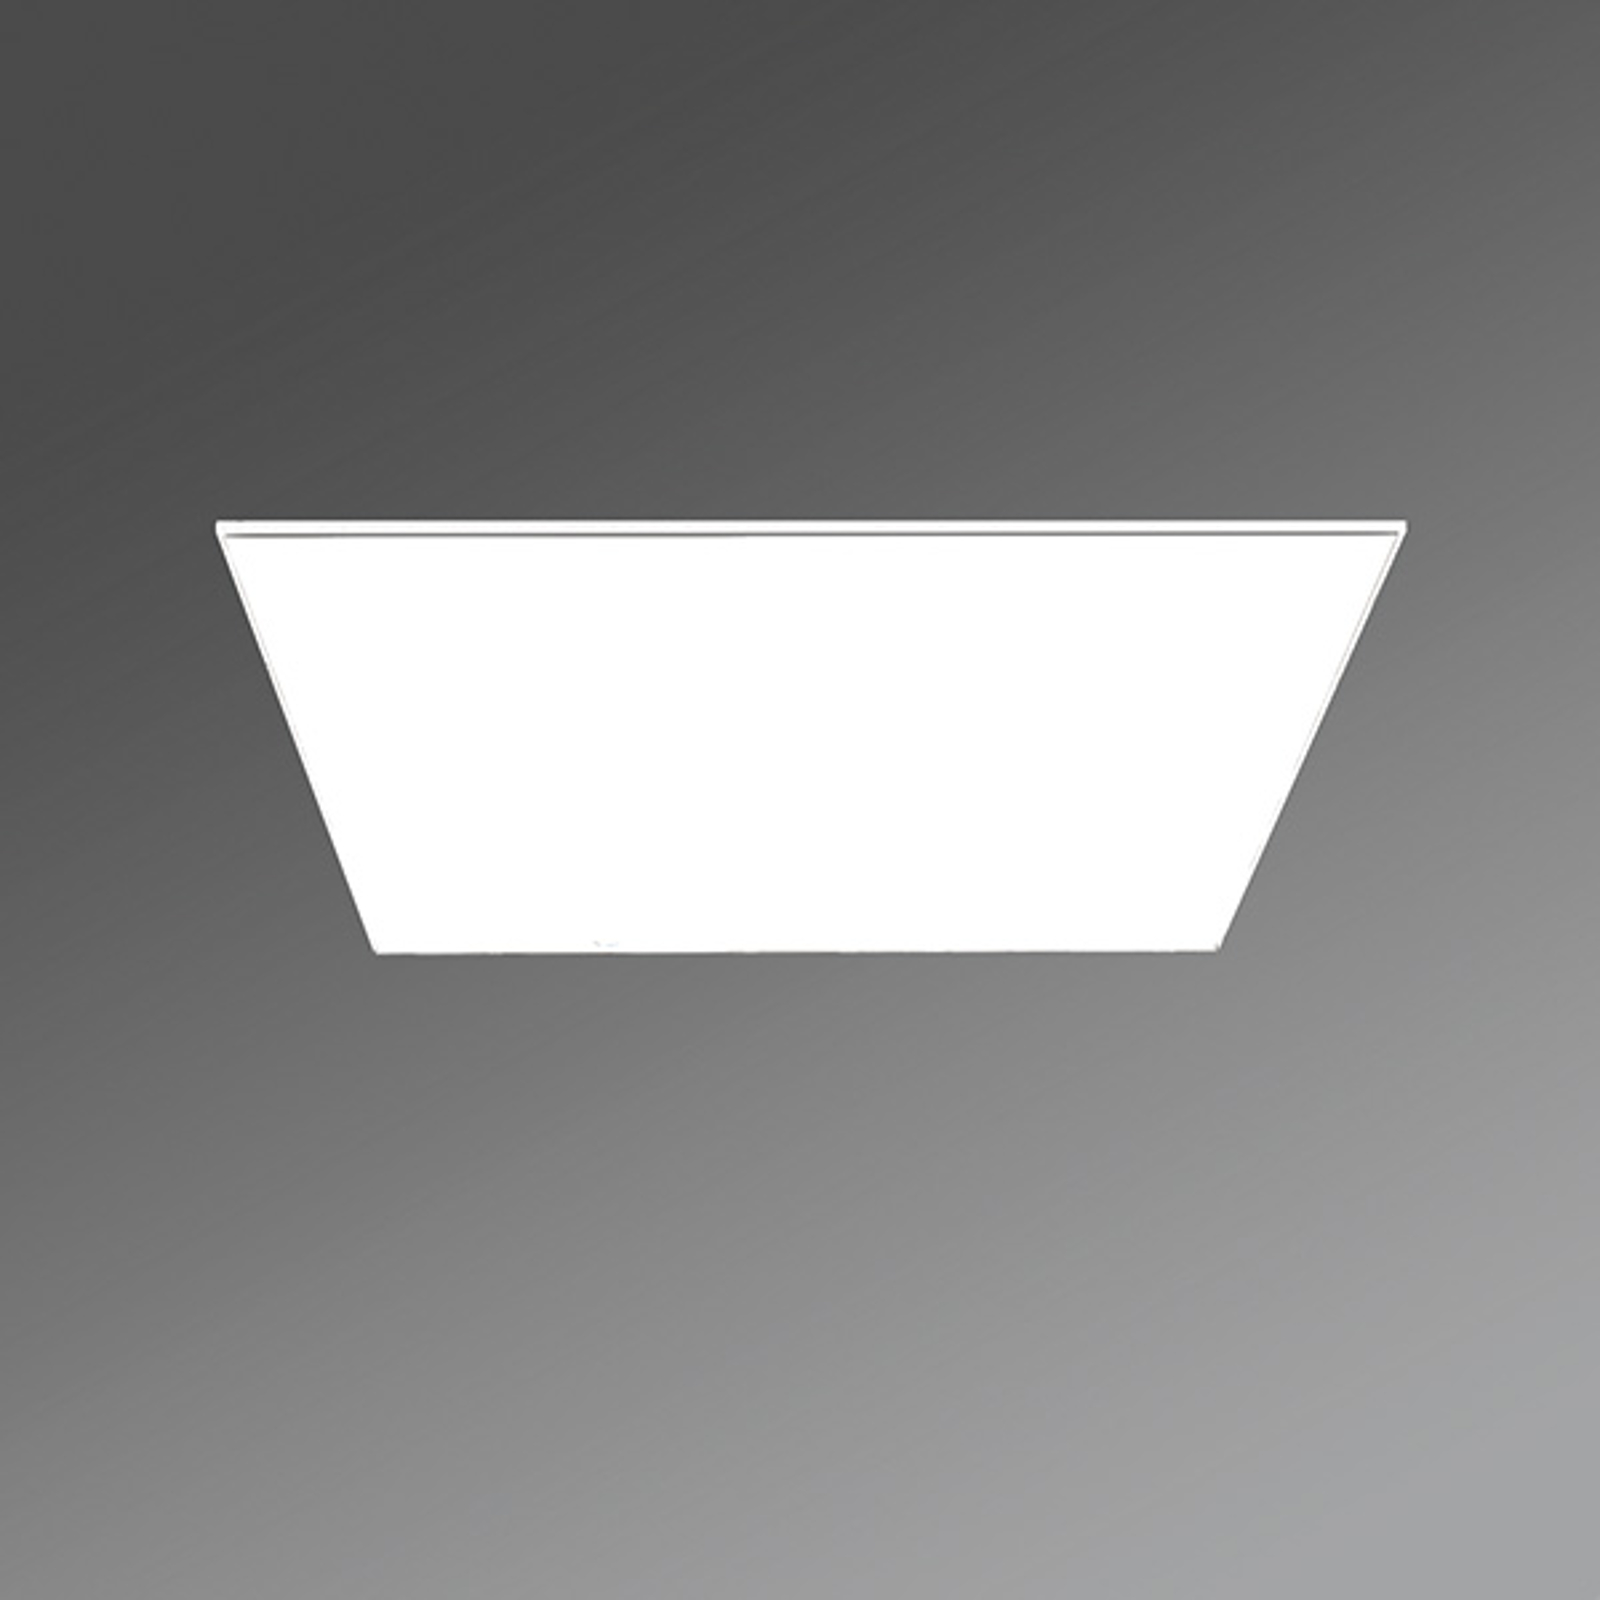 Flache LED-Einlegeleuchte Planara-PNEO IP54 BAP